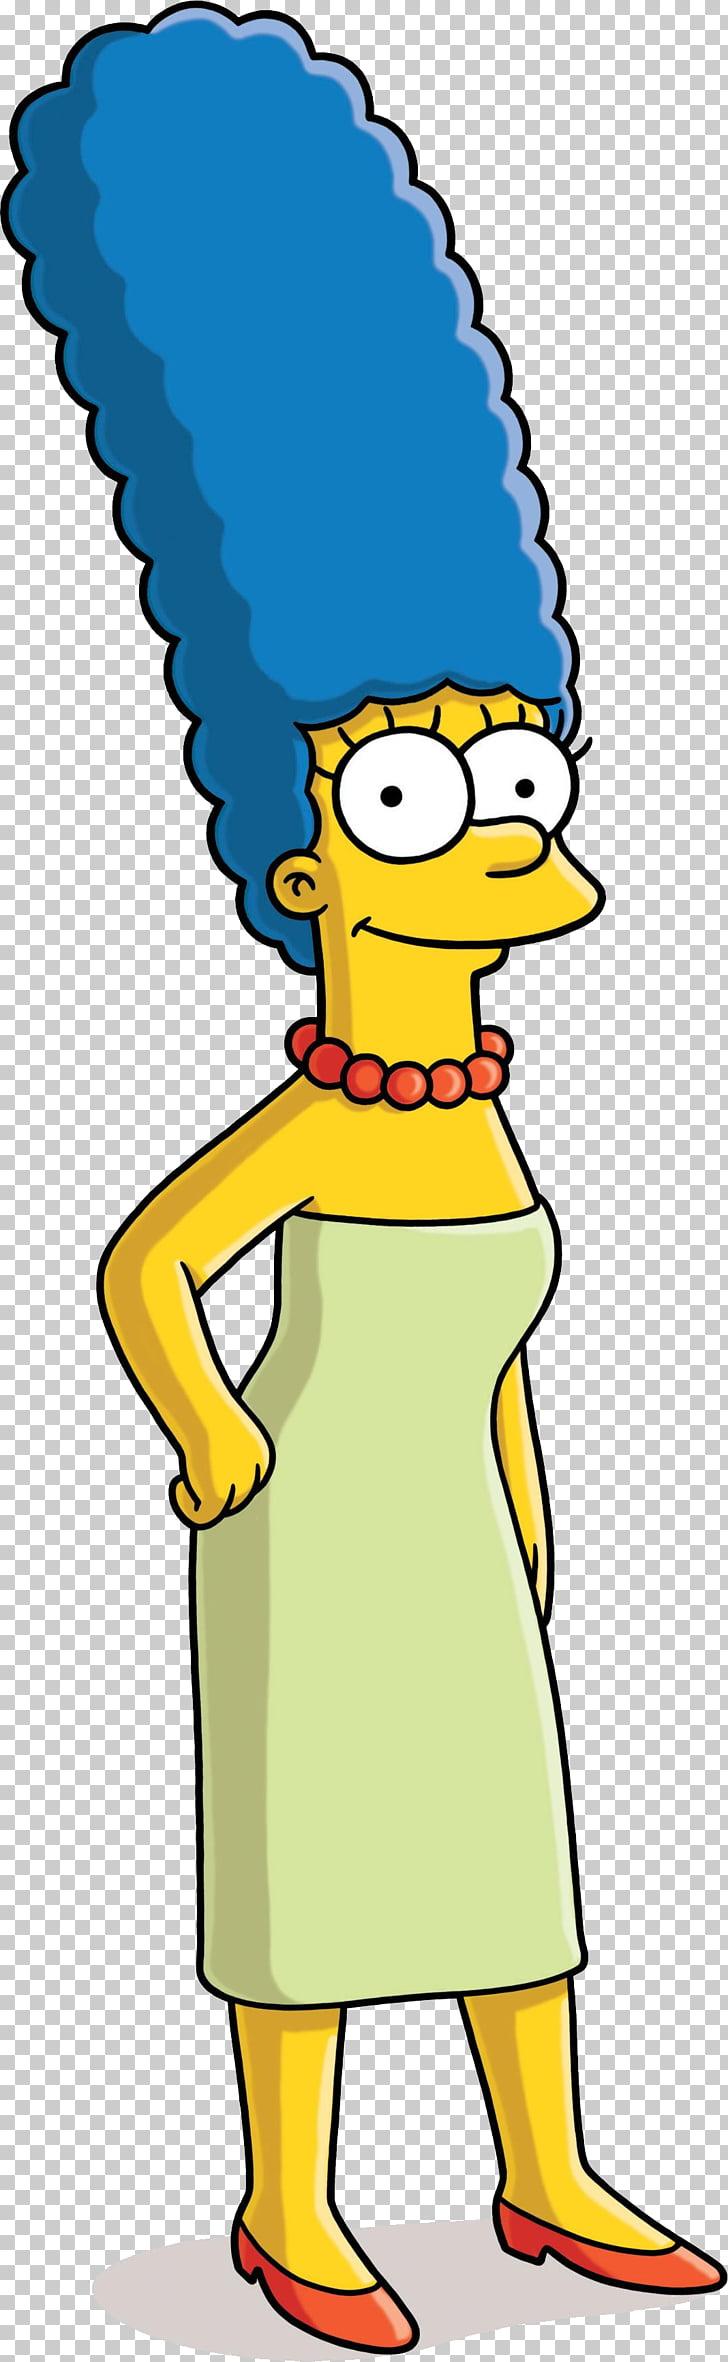 Marge el simpson de gangbang